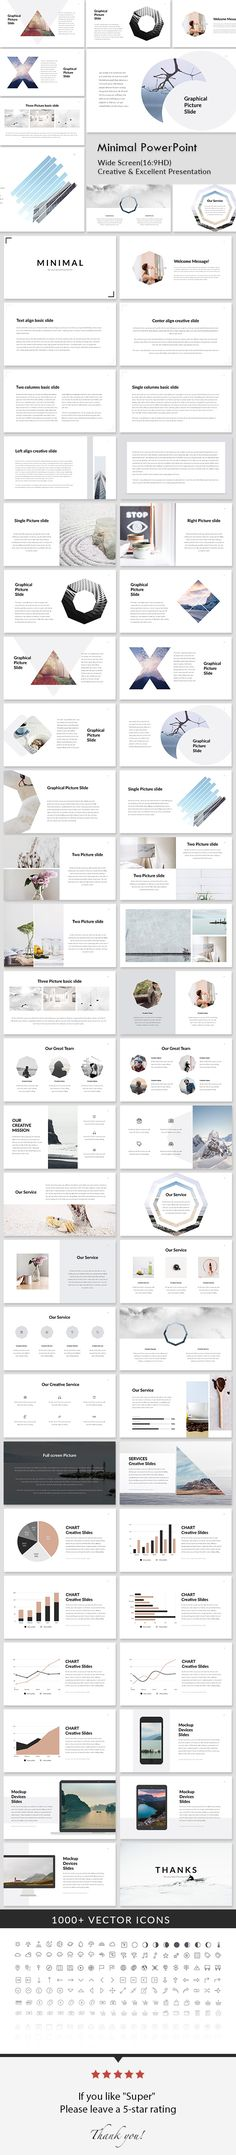 Minimal - Creative Powerpoint Presentation Template